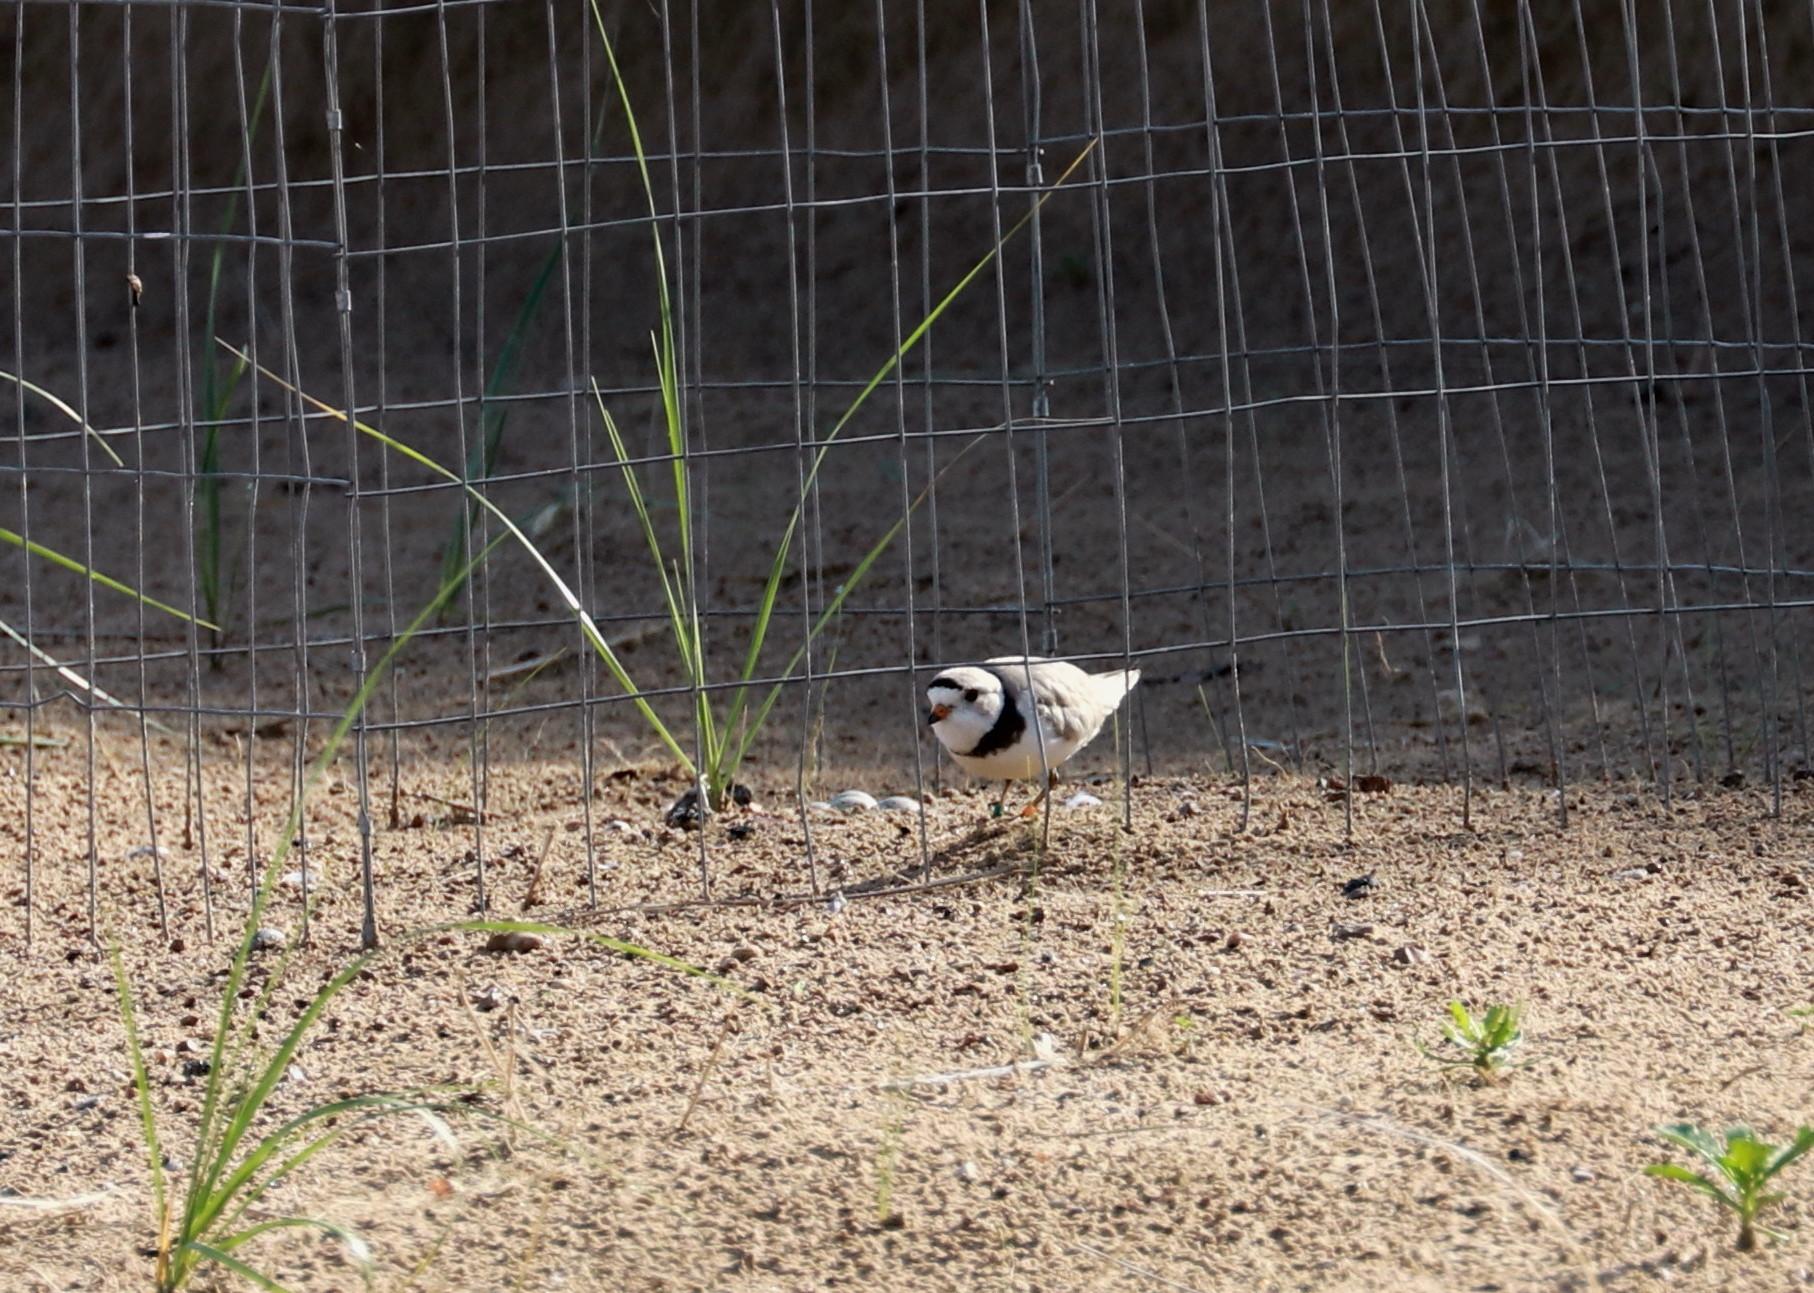 Monty at the enclosure - July 3